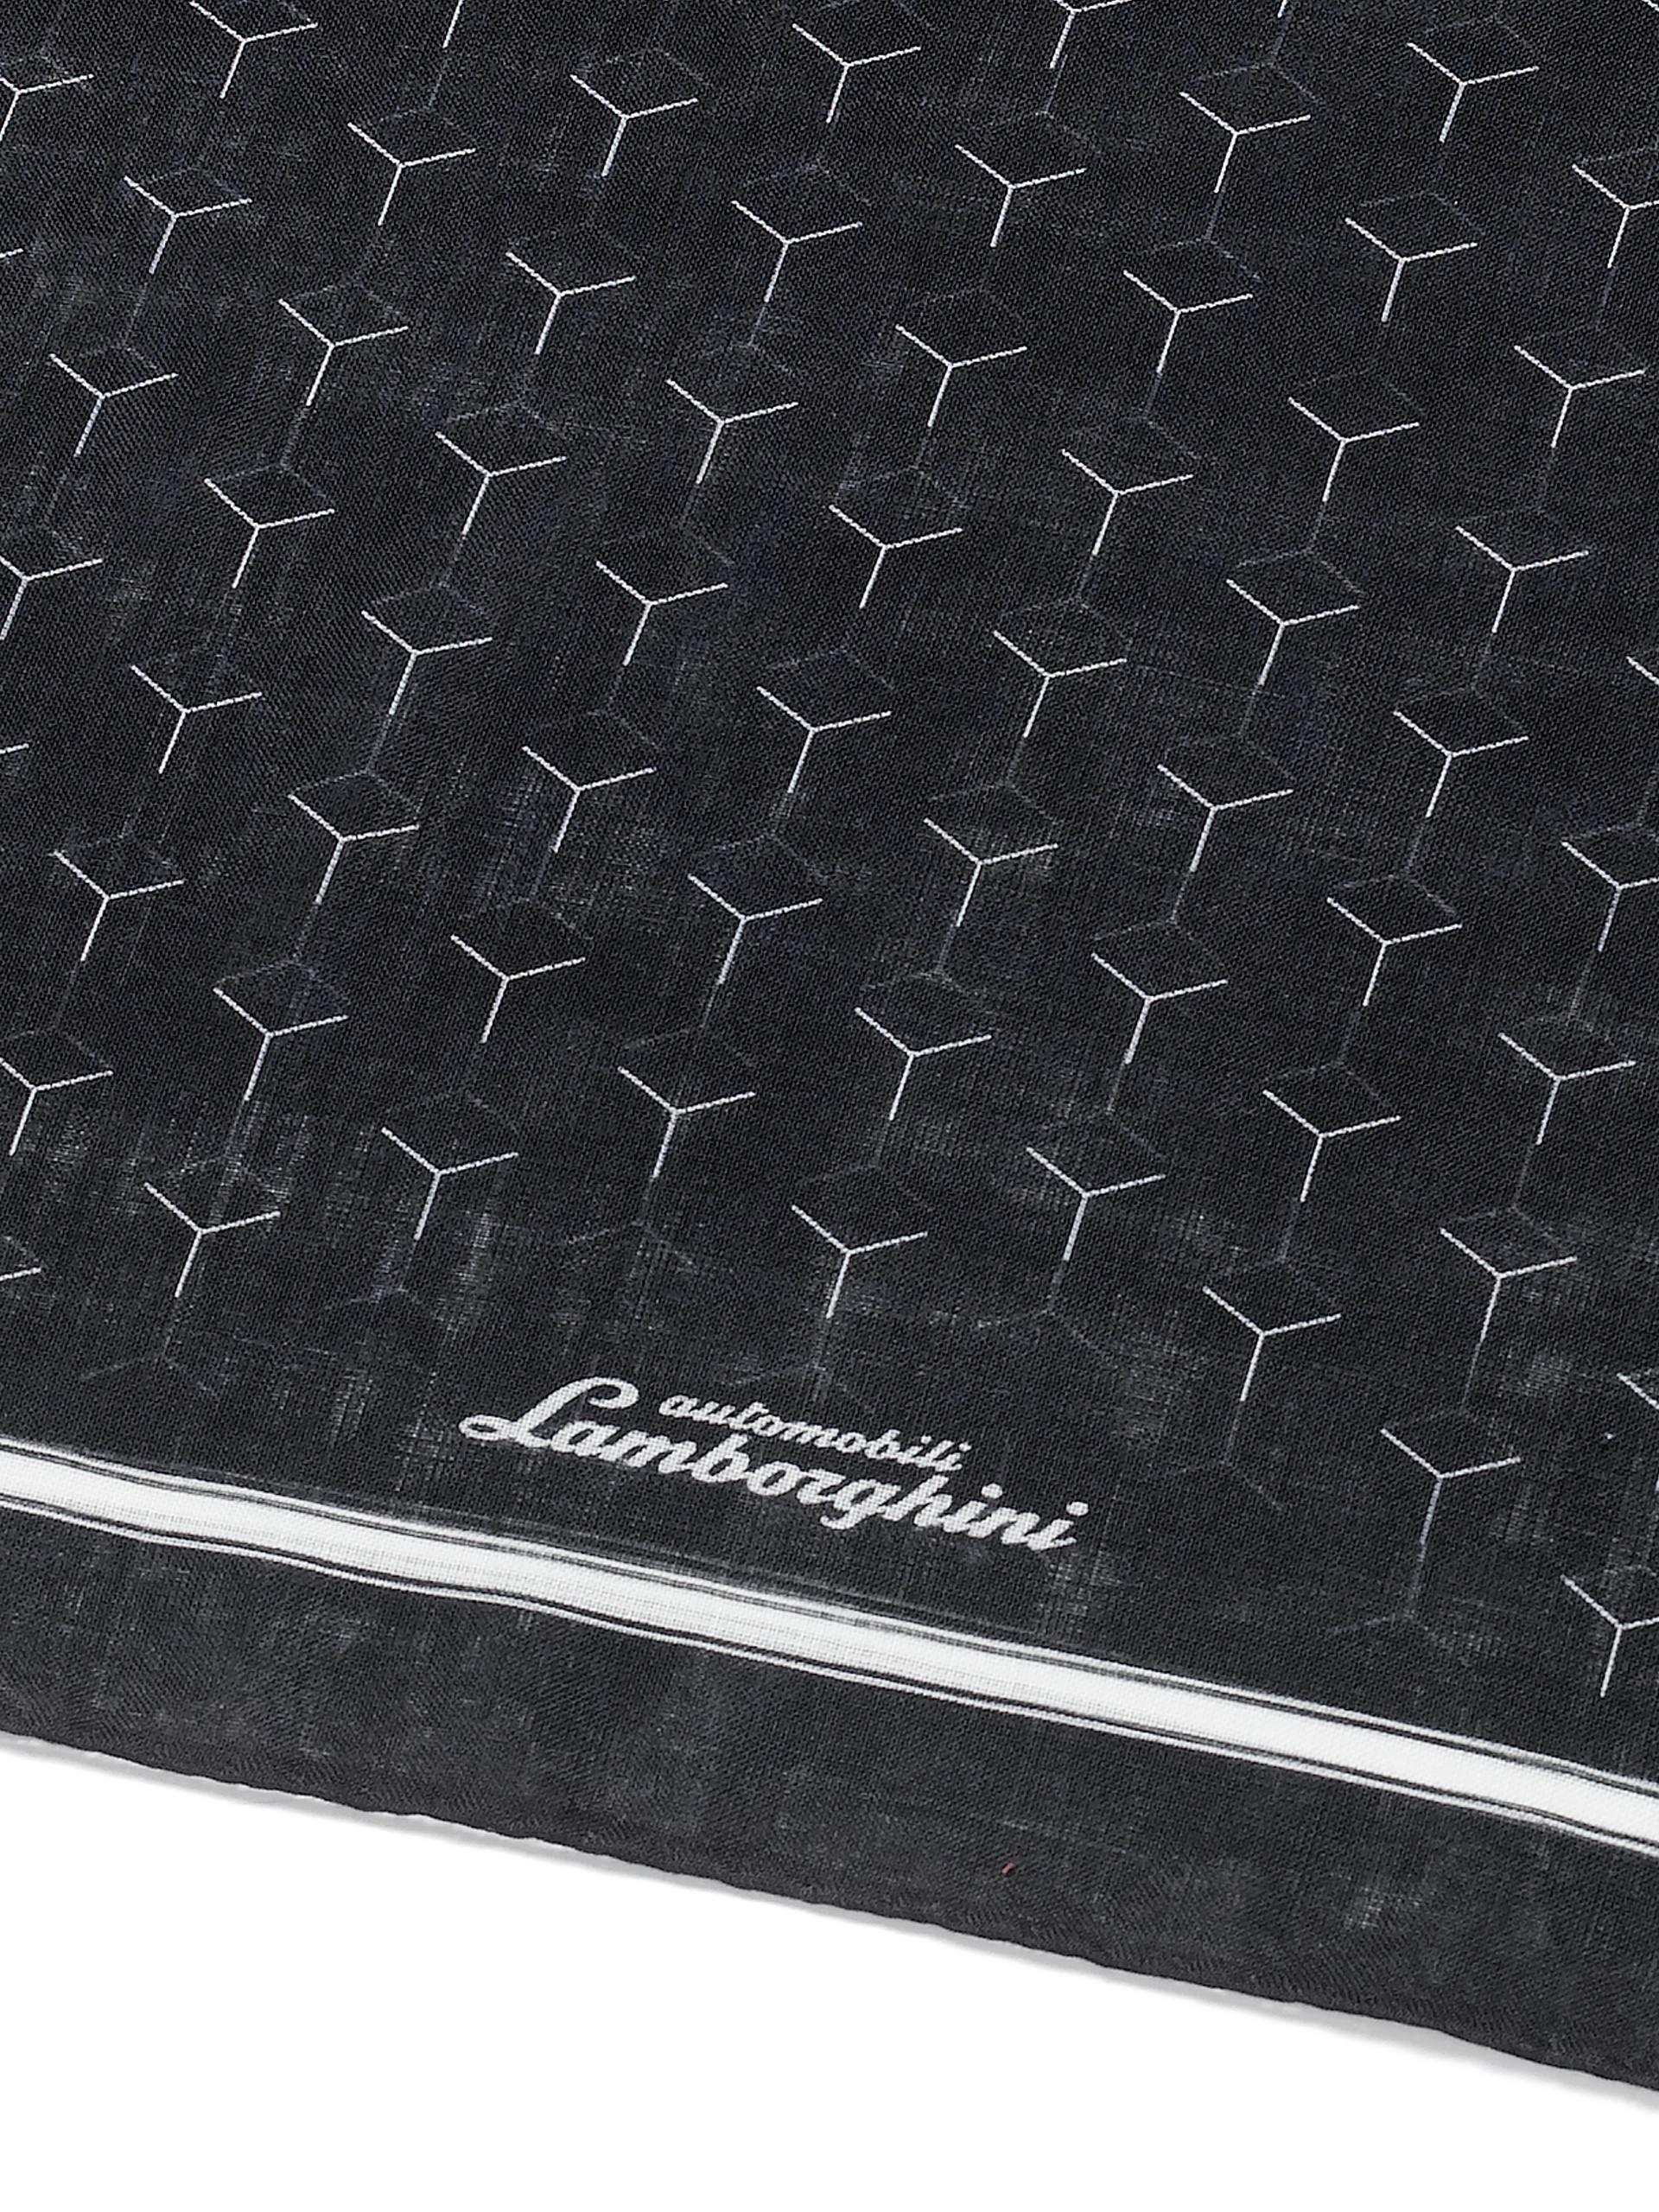 Lca Store Lamborghini Y Patterned Scarf Lamborghini